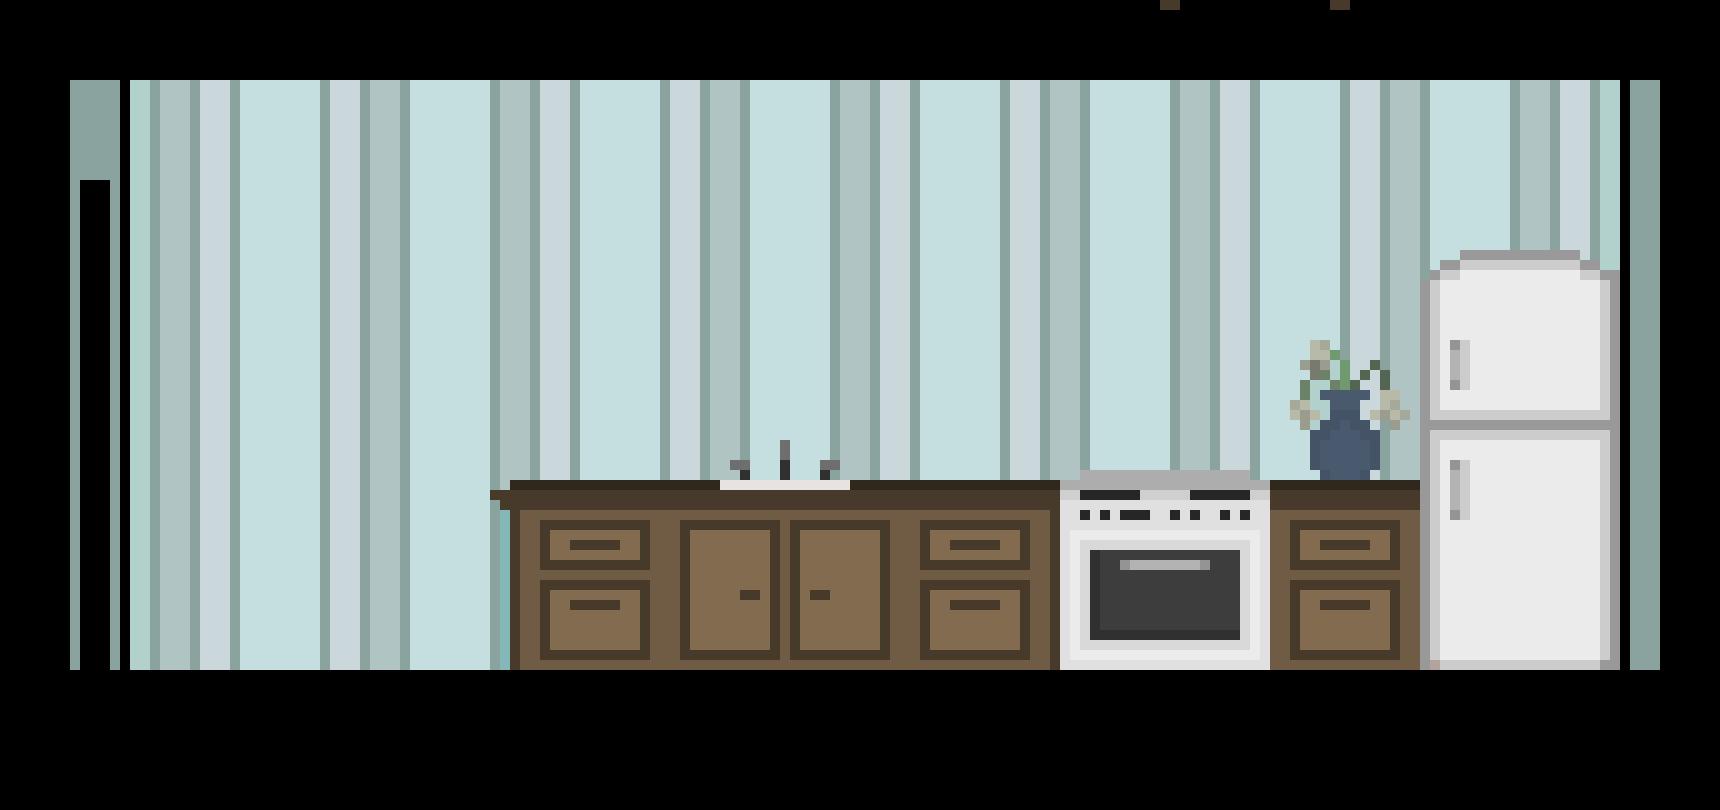 Kitchen | Pixel Art Maker